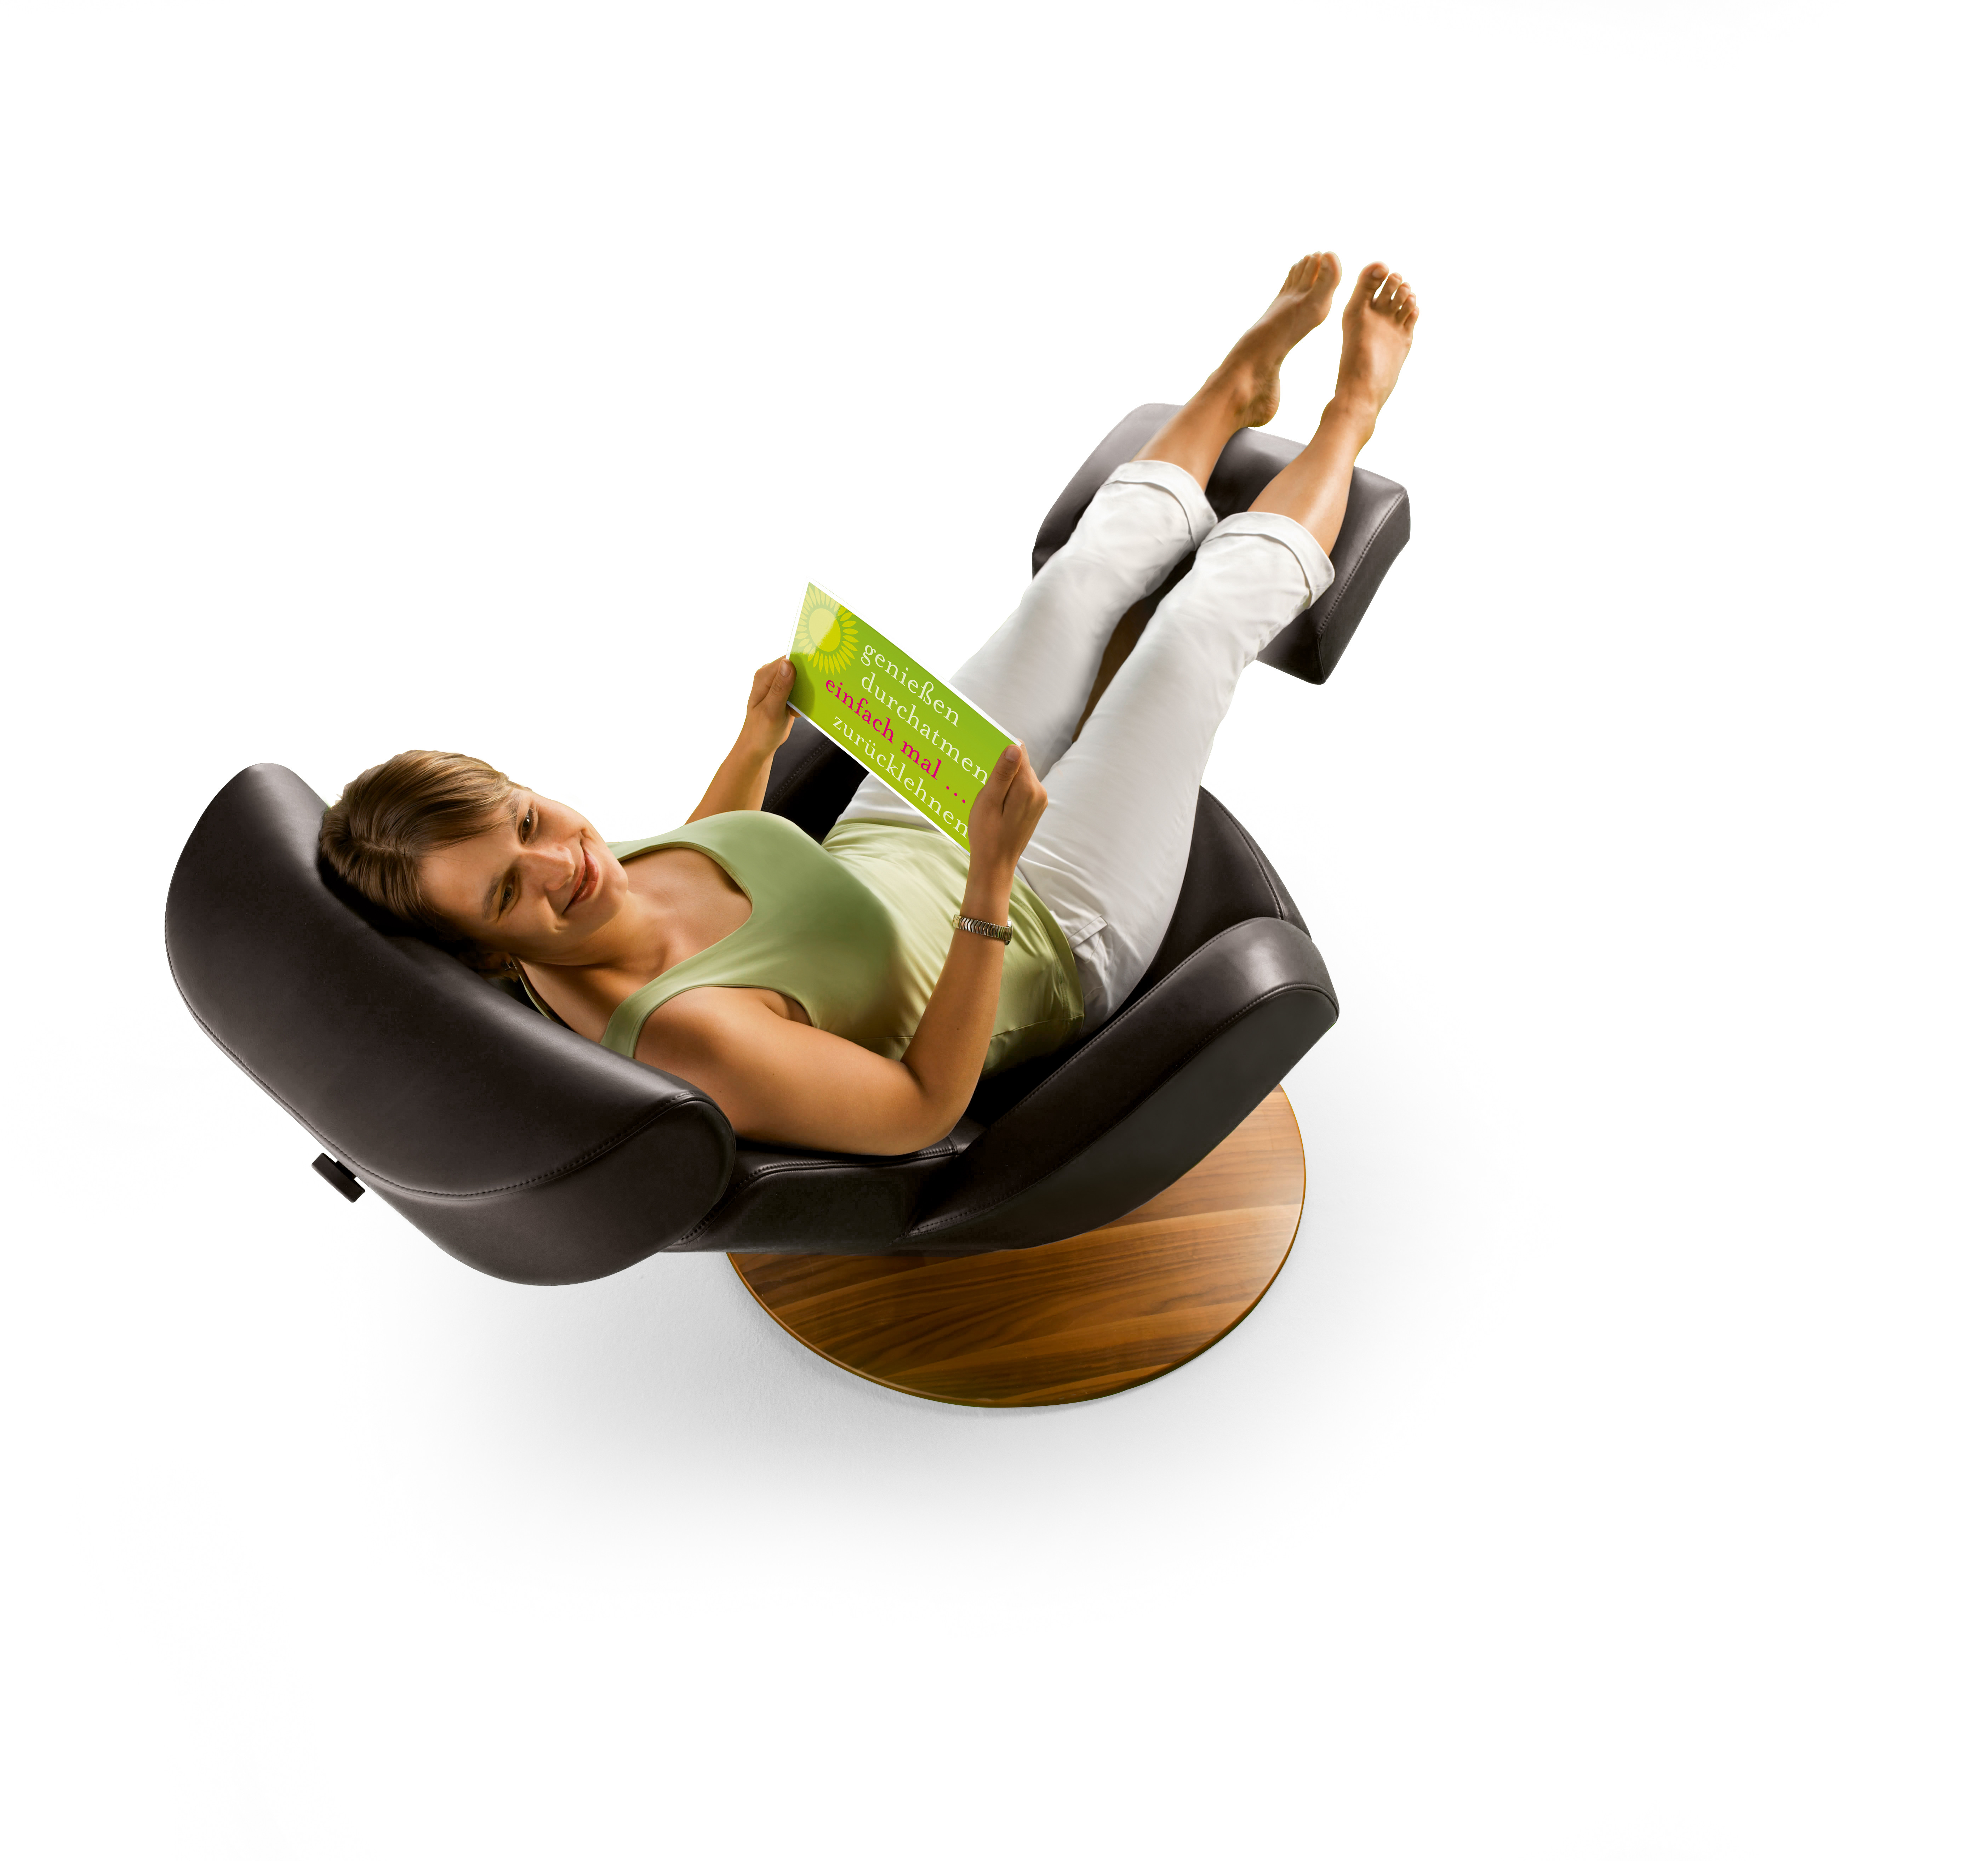 Fauteuil de relaxation en cuir moizi 31 fauteuils - Fauteuil de bureau relax ...